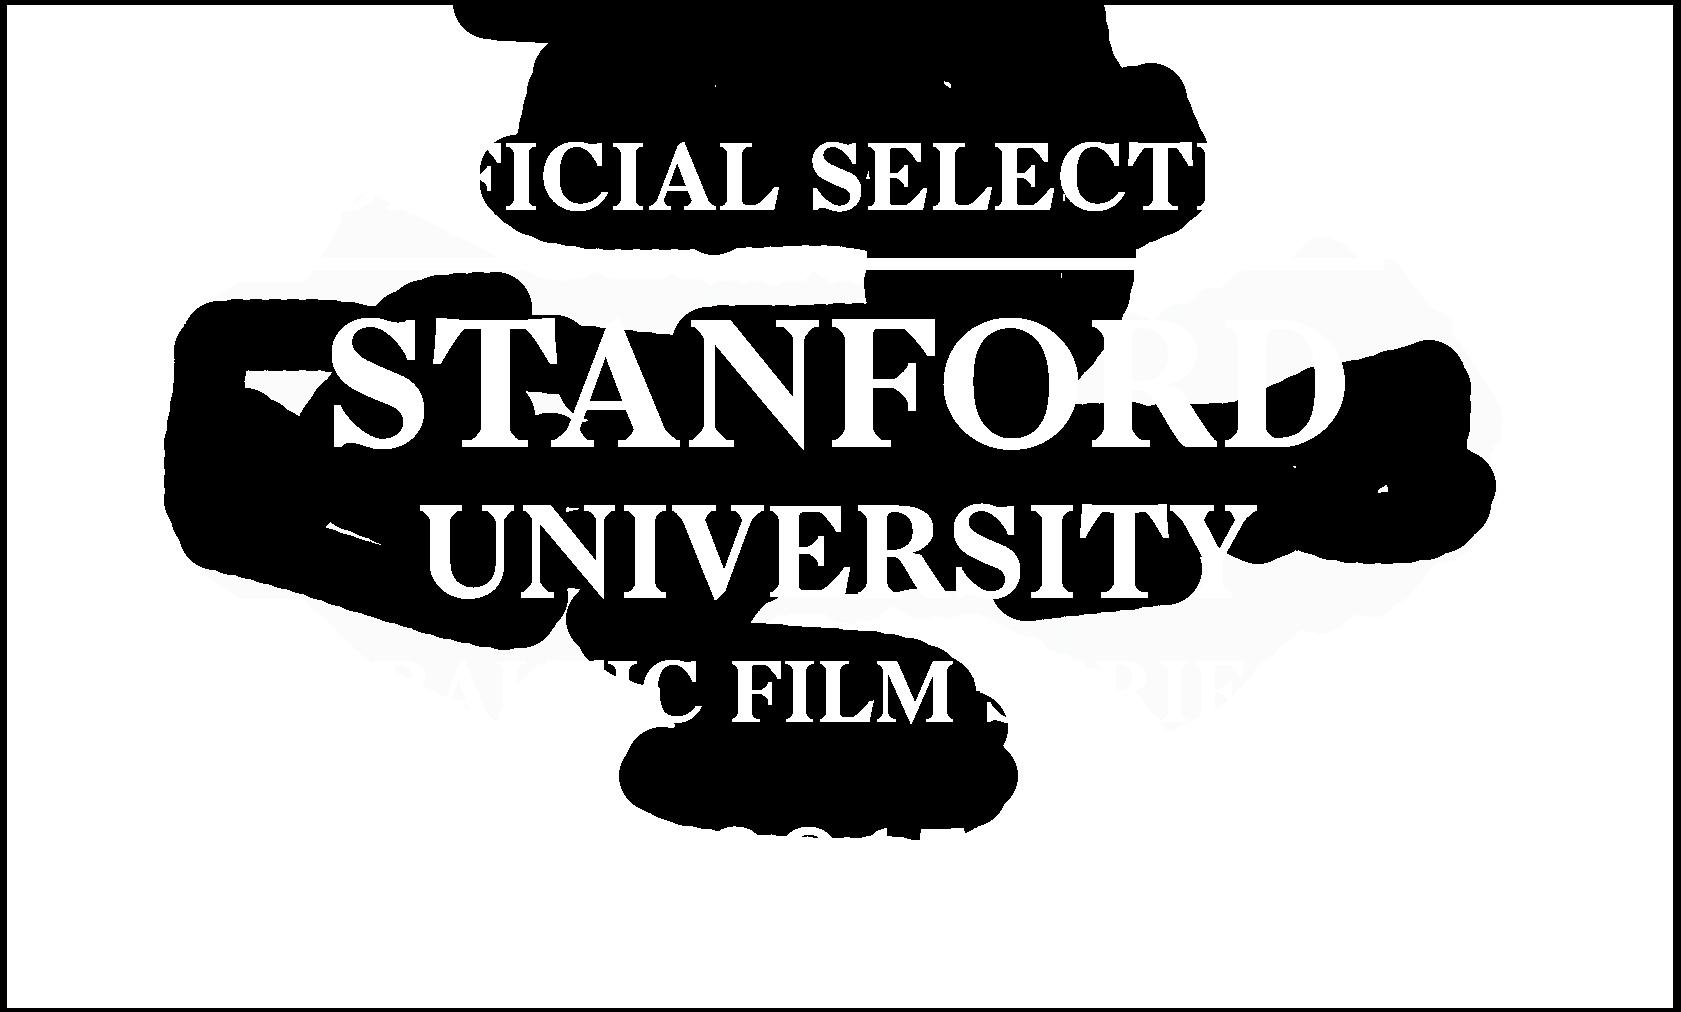 Laurel_StanfordOfficialSelectionFinal_w.png